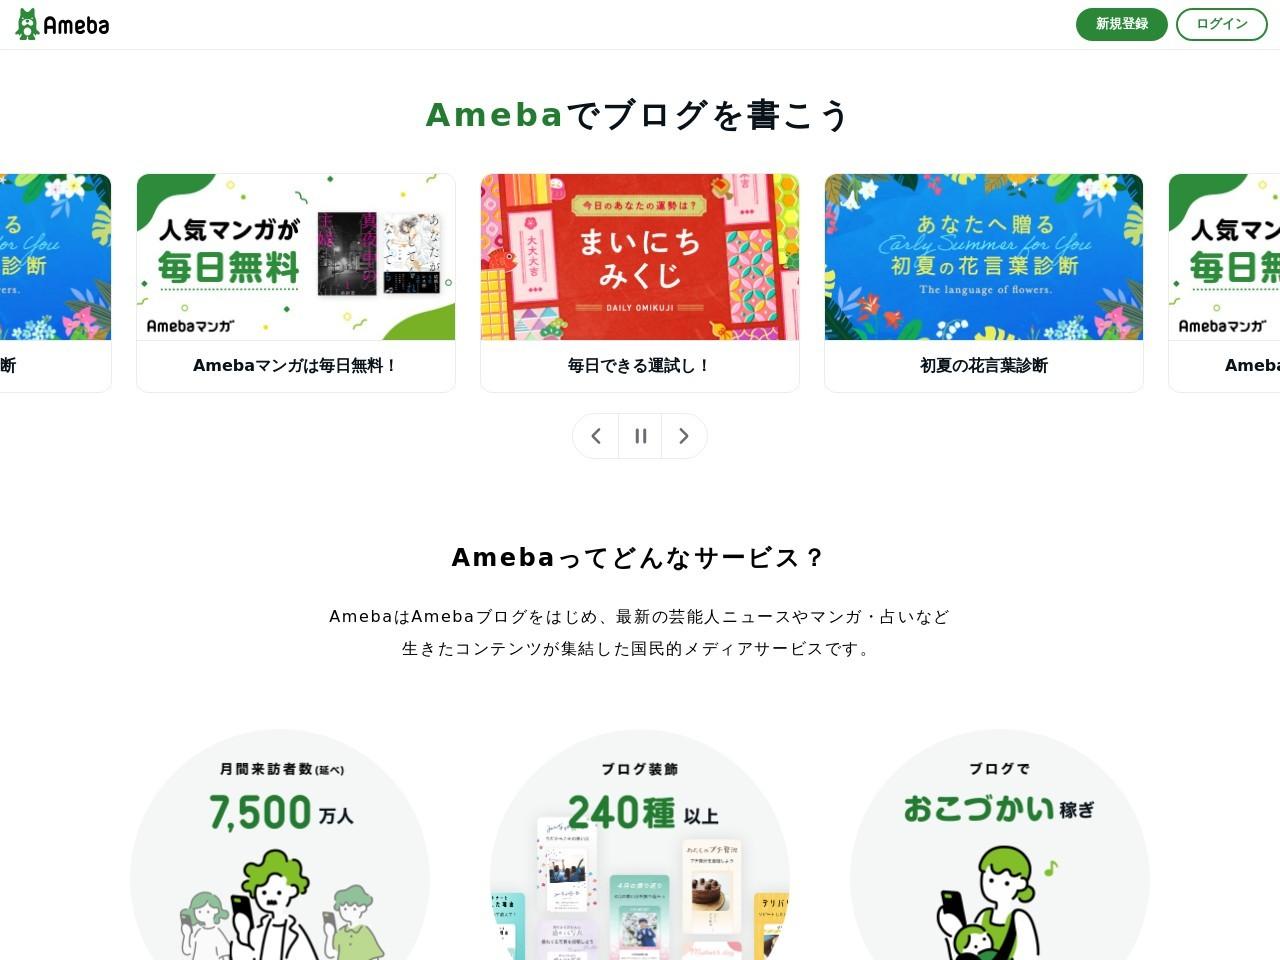 http://ameblo.jp/scfc2000/entry-11230771198.html